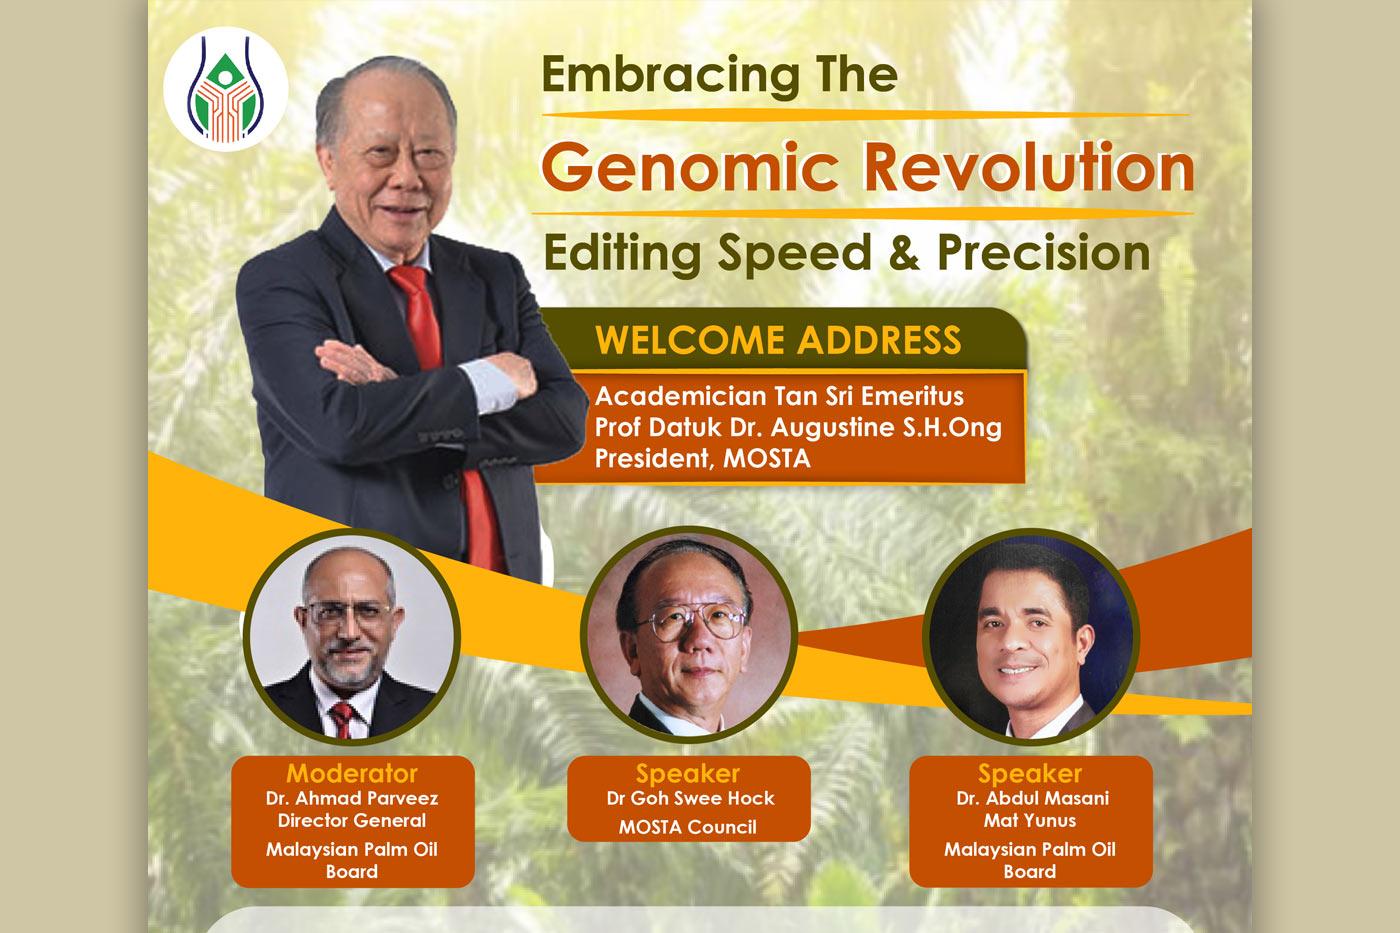 embracing-the-genomic-revolution